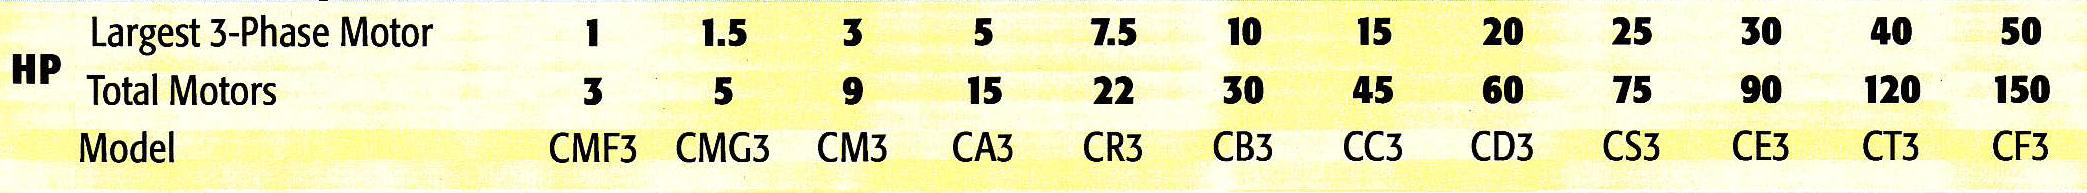 Dyna-phase3